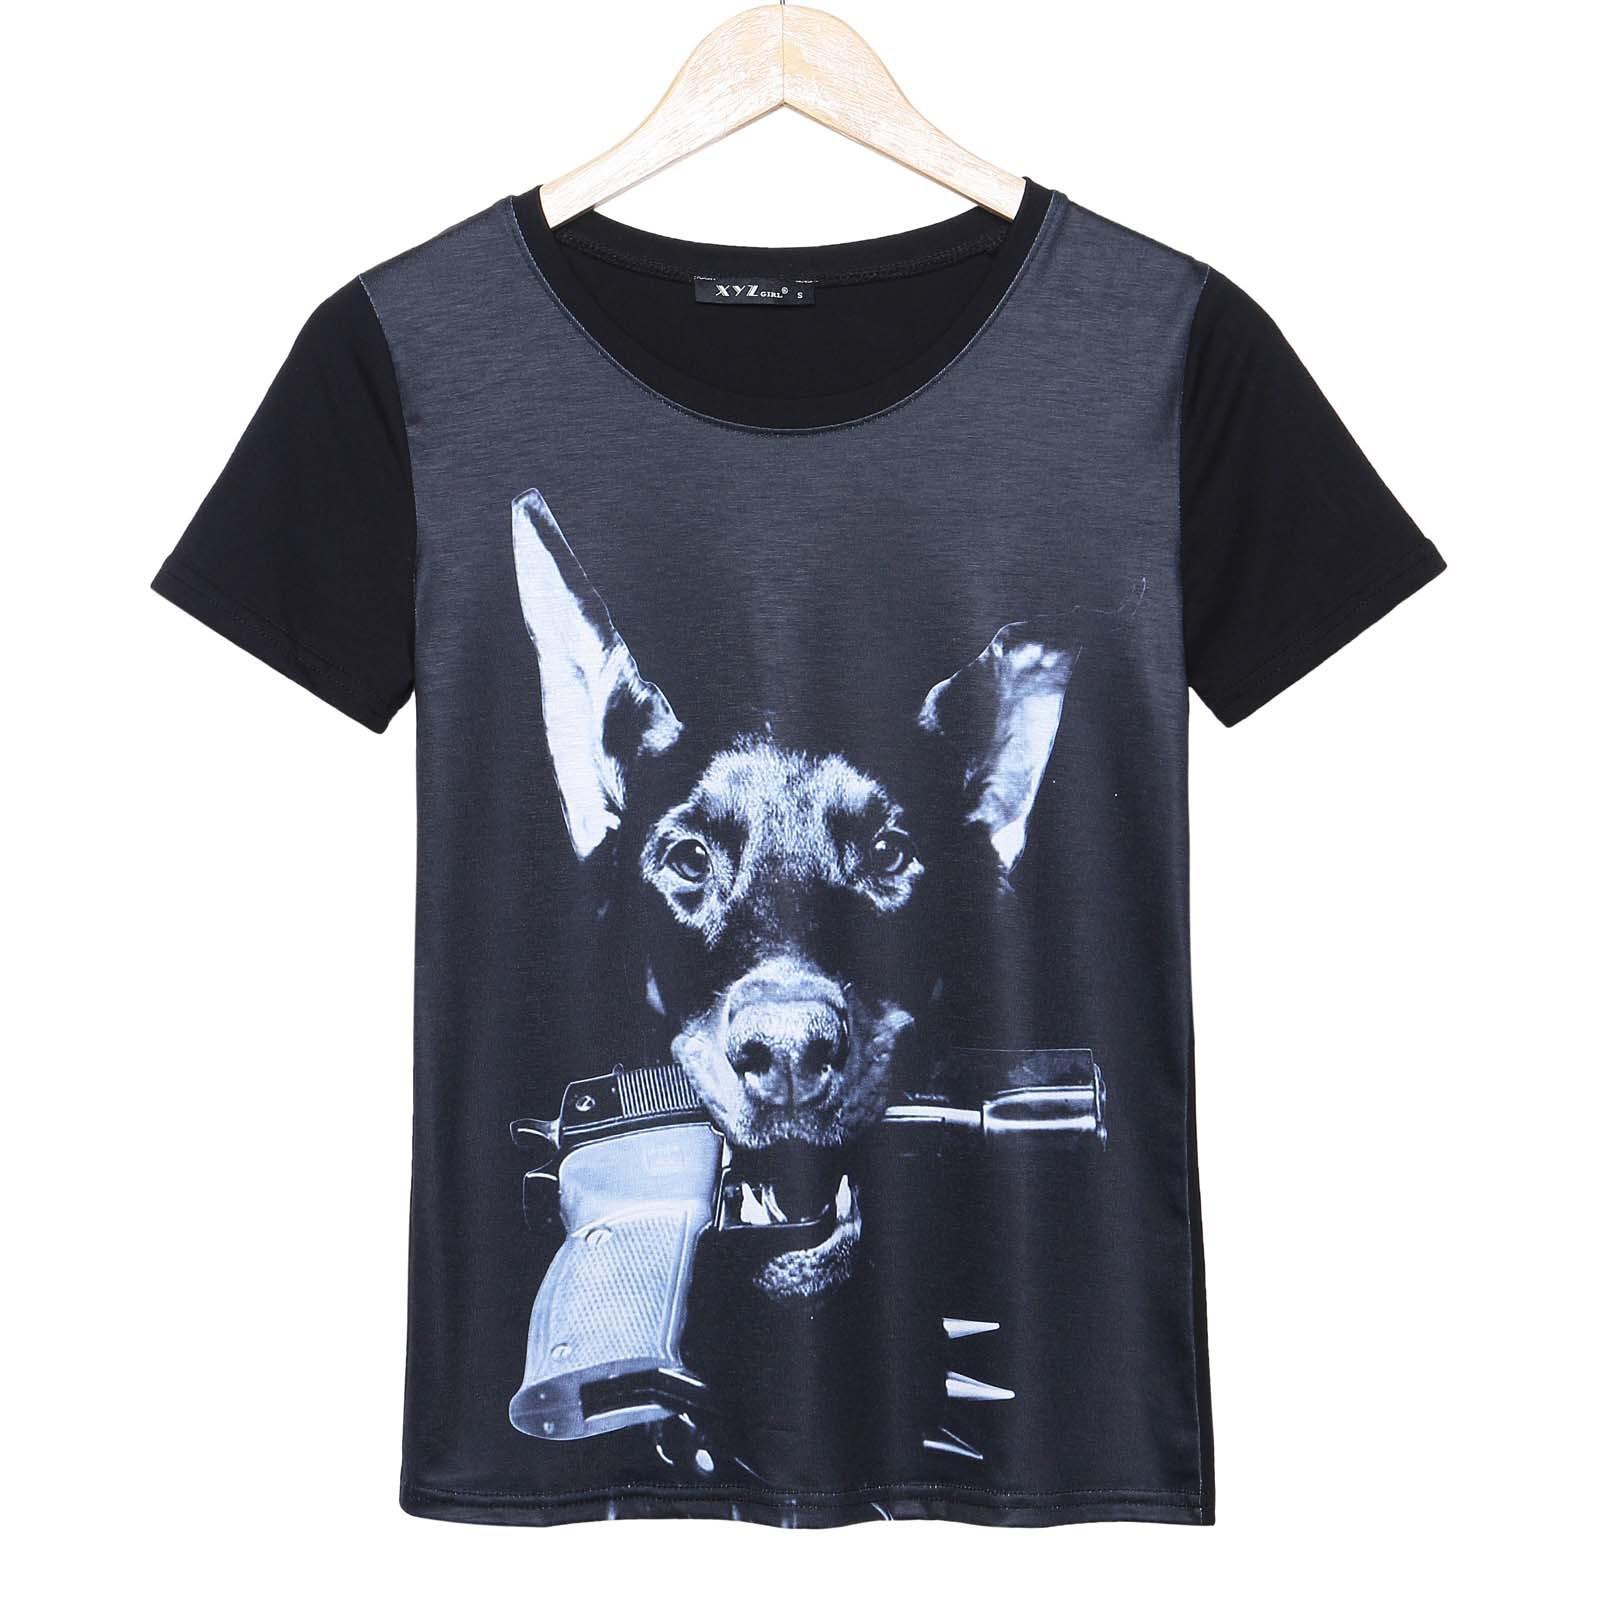 2015 casual fashion t shirt women gun dog printed t shirt for Where to get t shirts printed